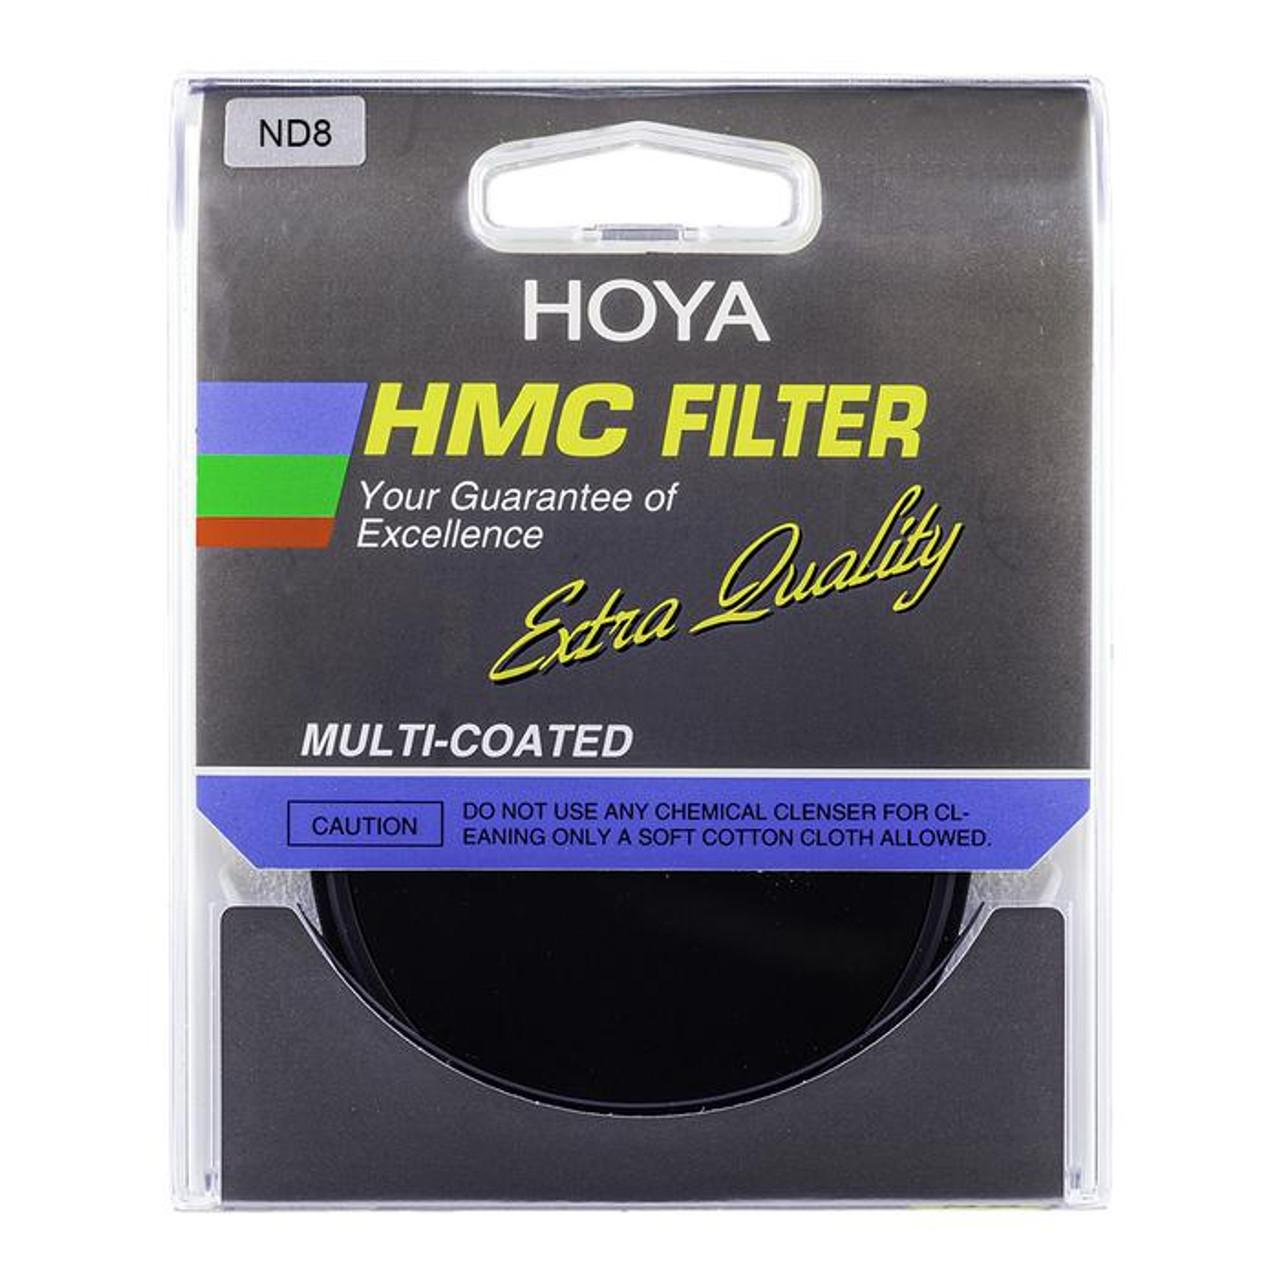 HOYA HMC NEUTRAL DENSITY FILTERS ND8 (3-STOPS)